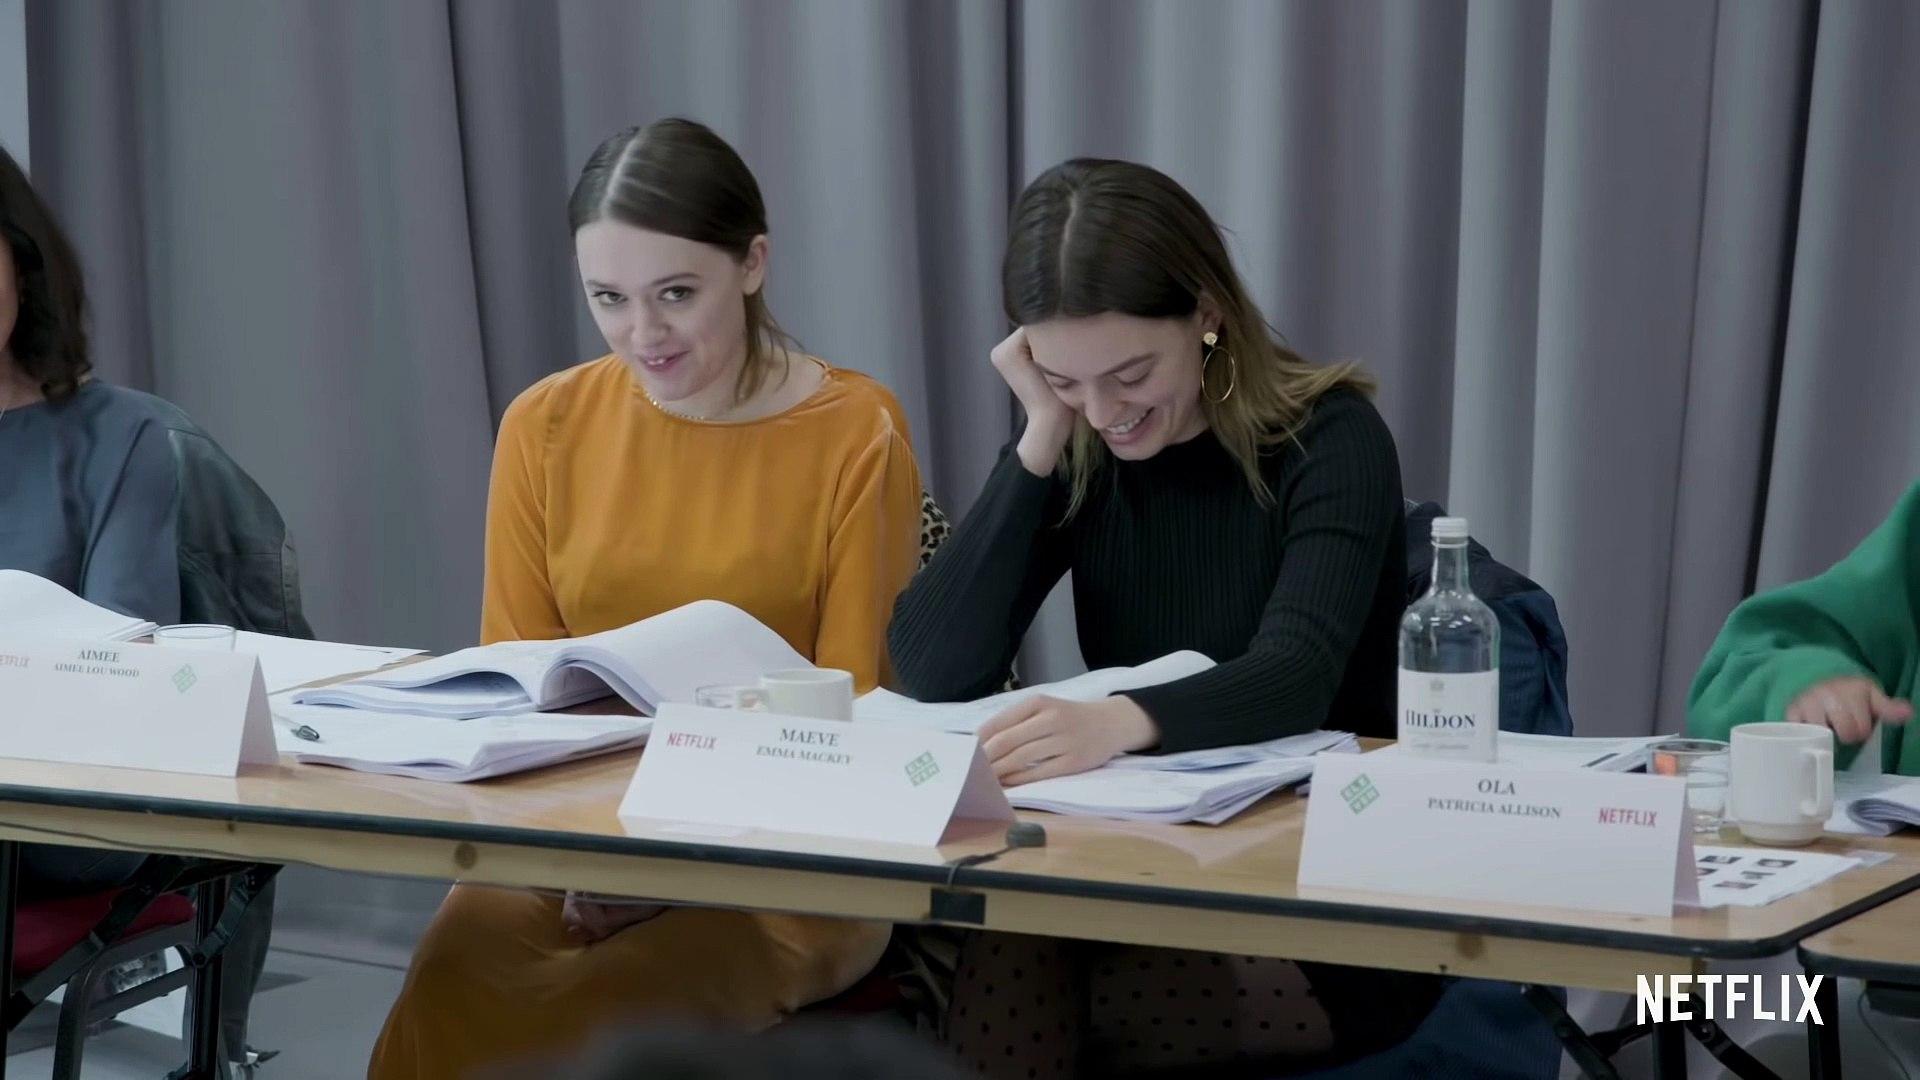 Sex Education Season 2 - The Cast of Sex Education Reacts To Season 2 Scripts